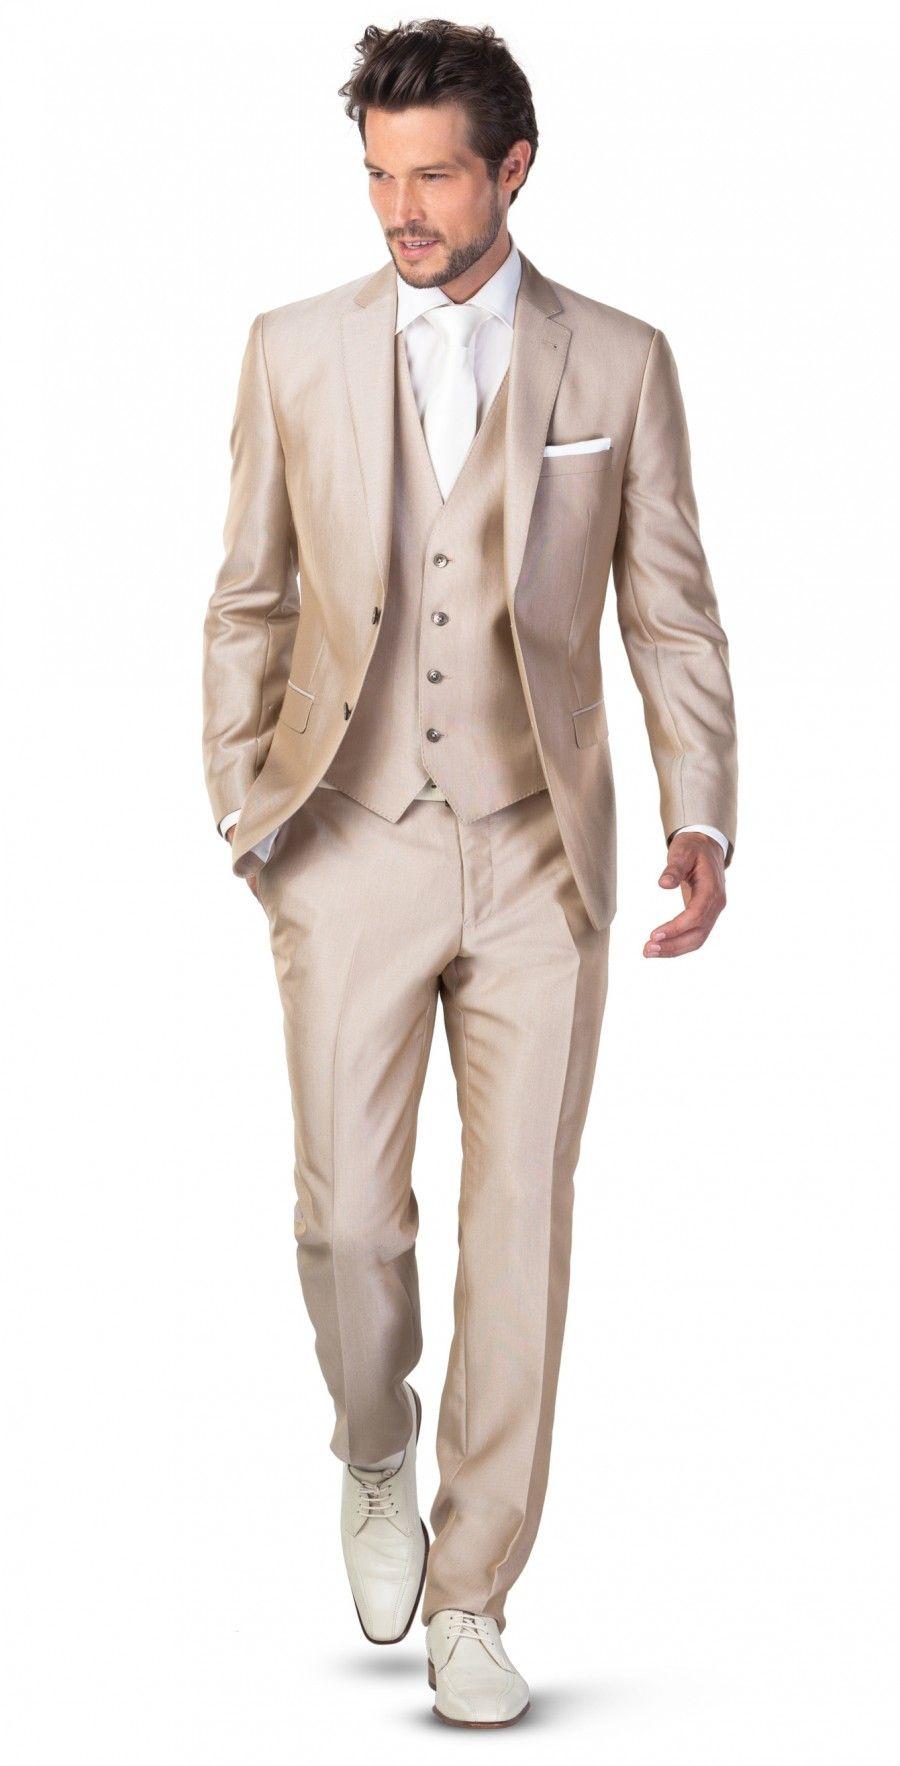 Pin by James Santangelo on Tuxedo\'s & Tuxedo Suits | Pinterest ...